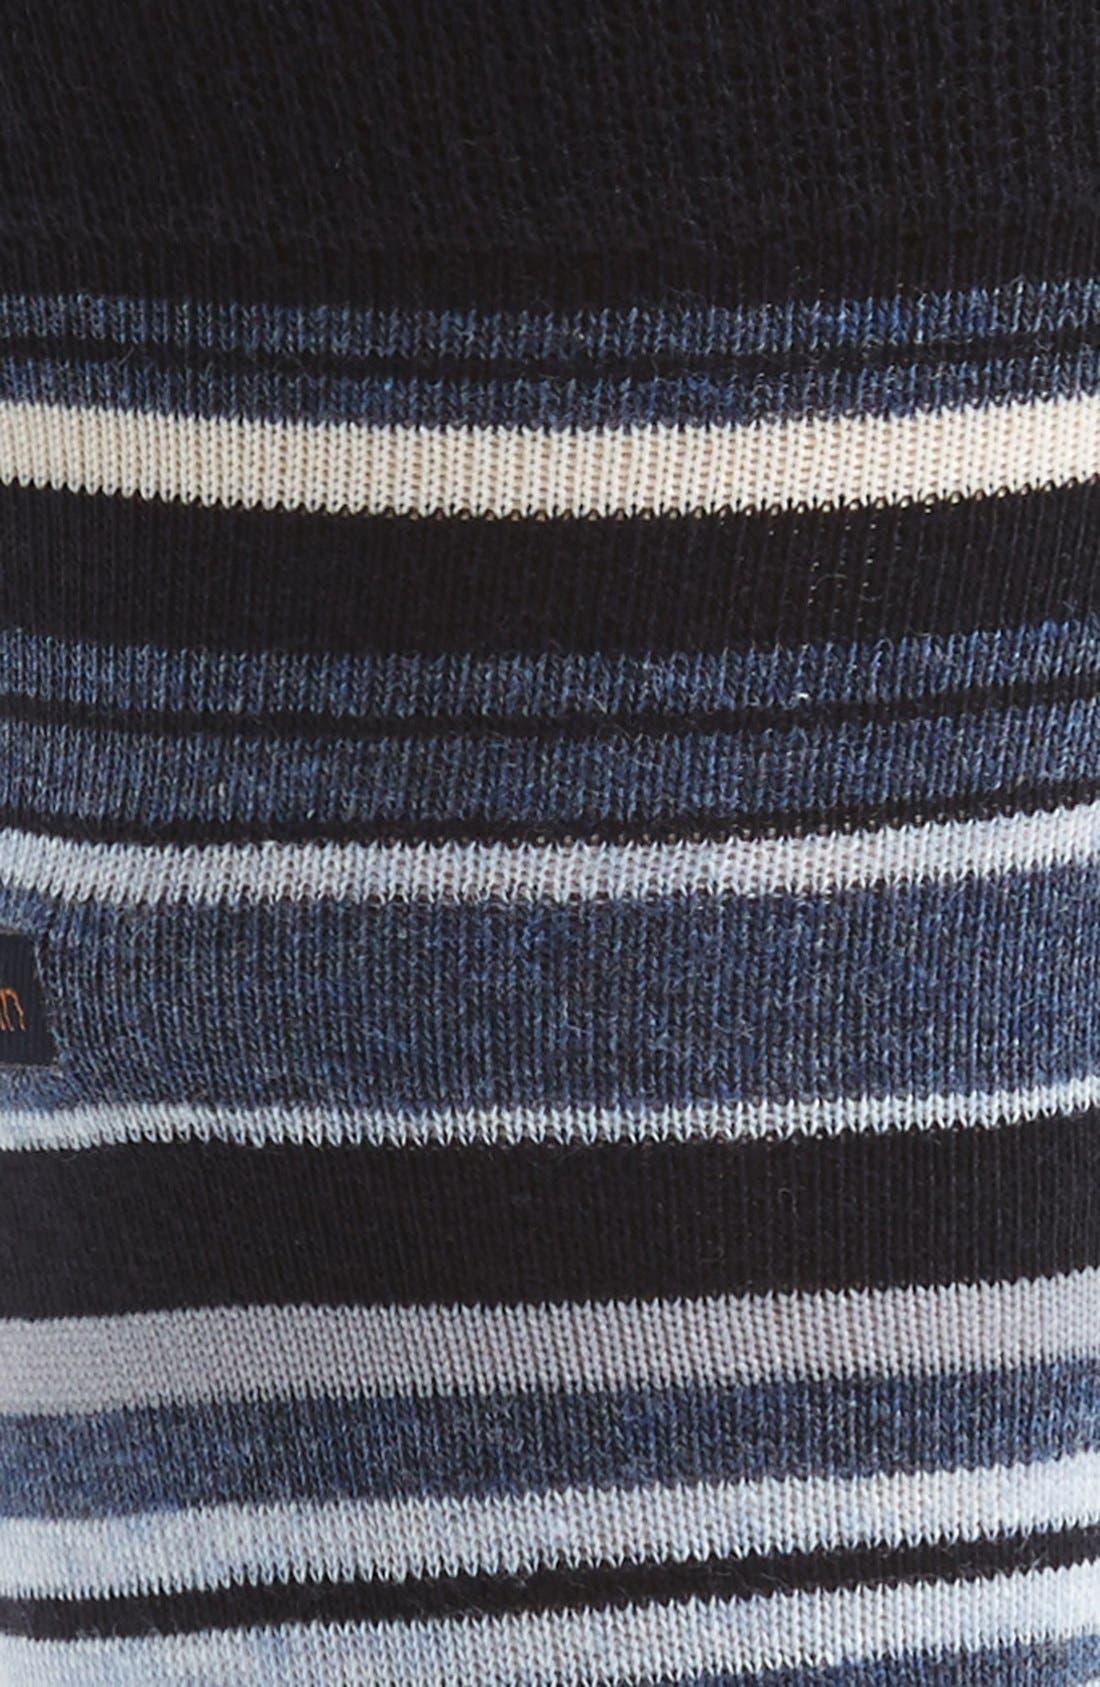 CALVIN KLEIN, Multistripe Emblem Socks, Alternate thumbnail 2, color, NAVY/ DENIM HEATHER